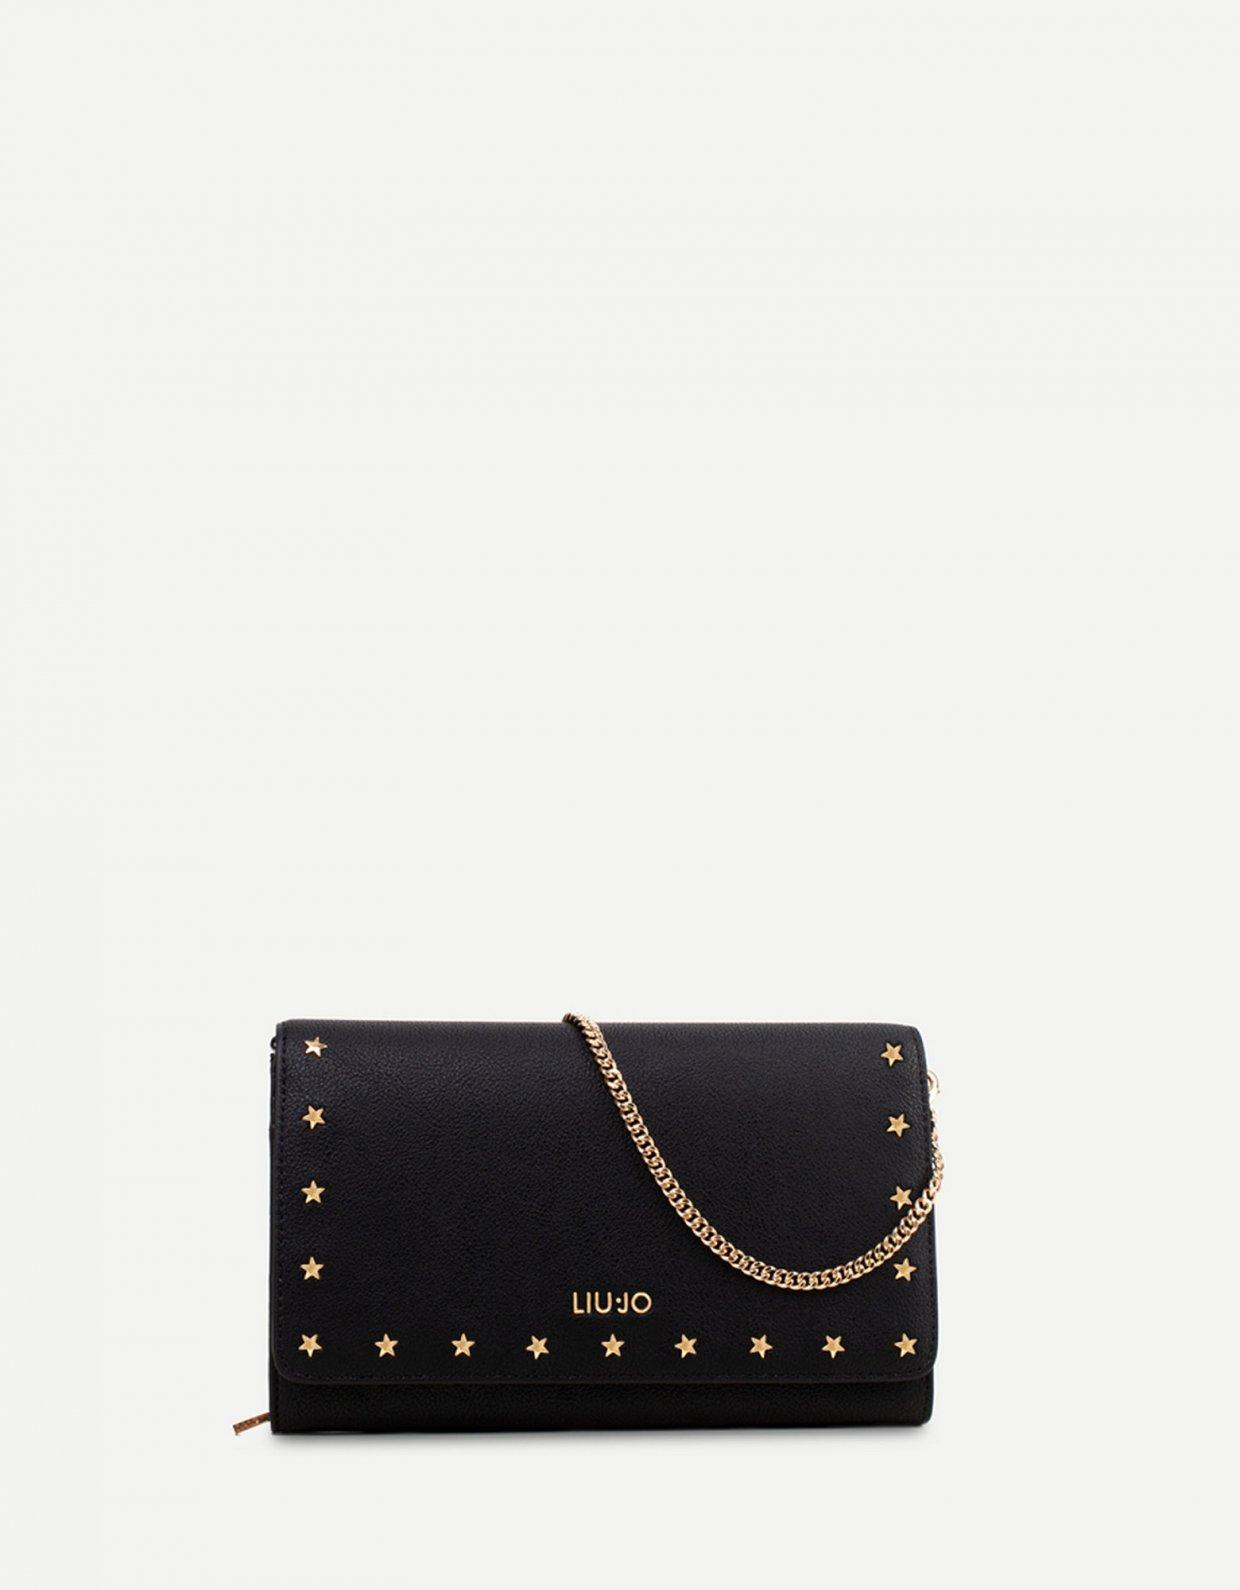 Liu Jo Clutch bag with stars black